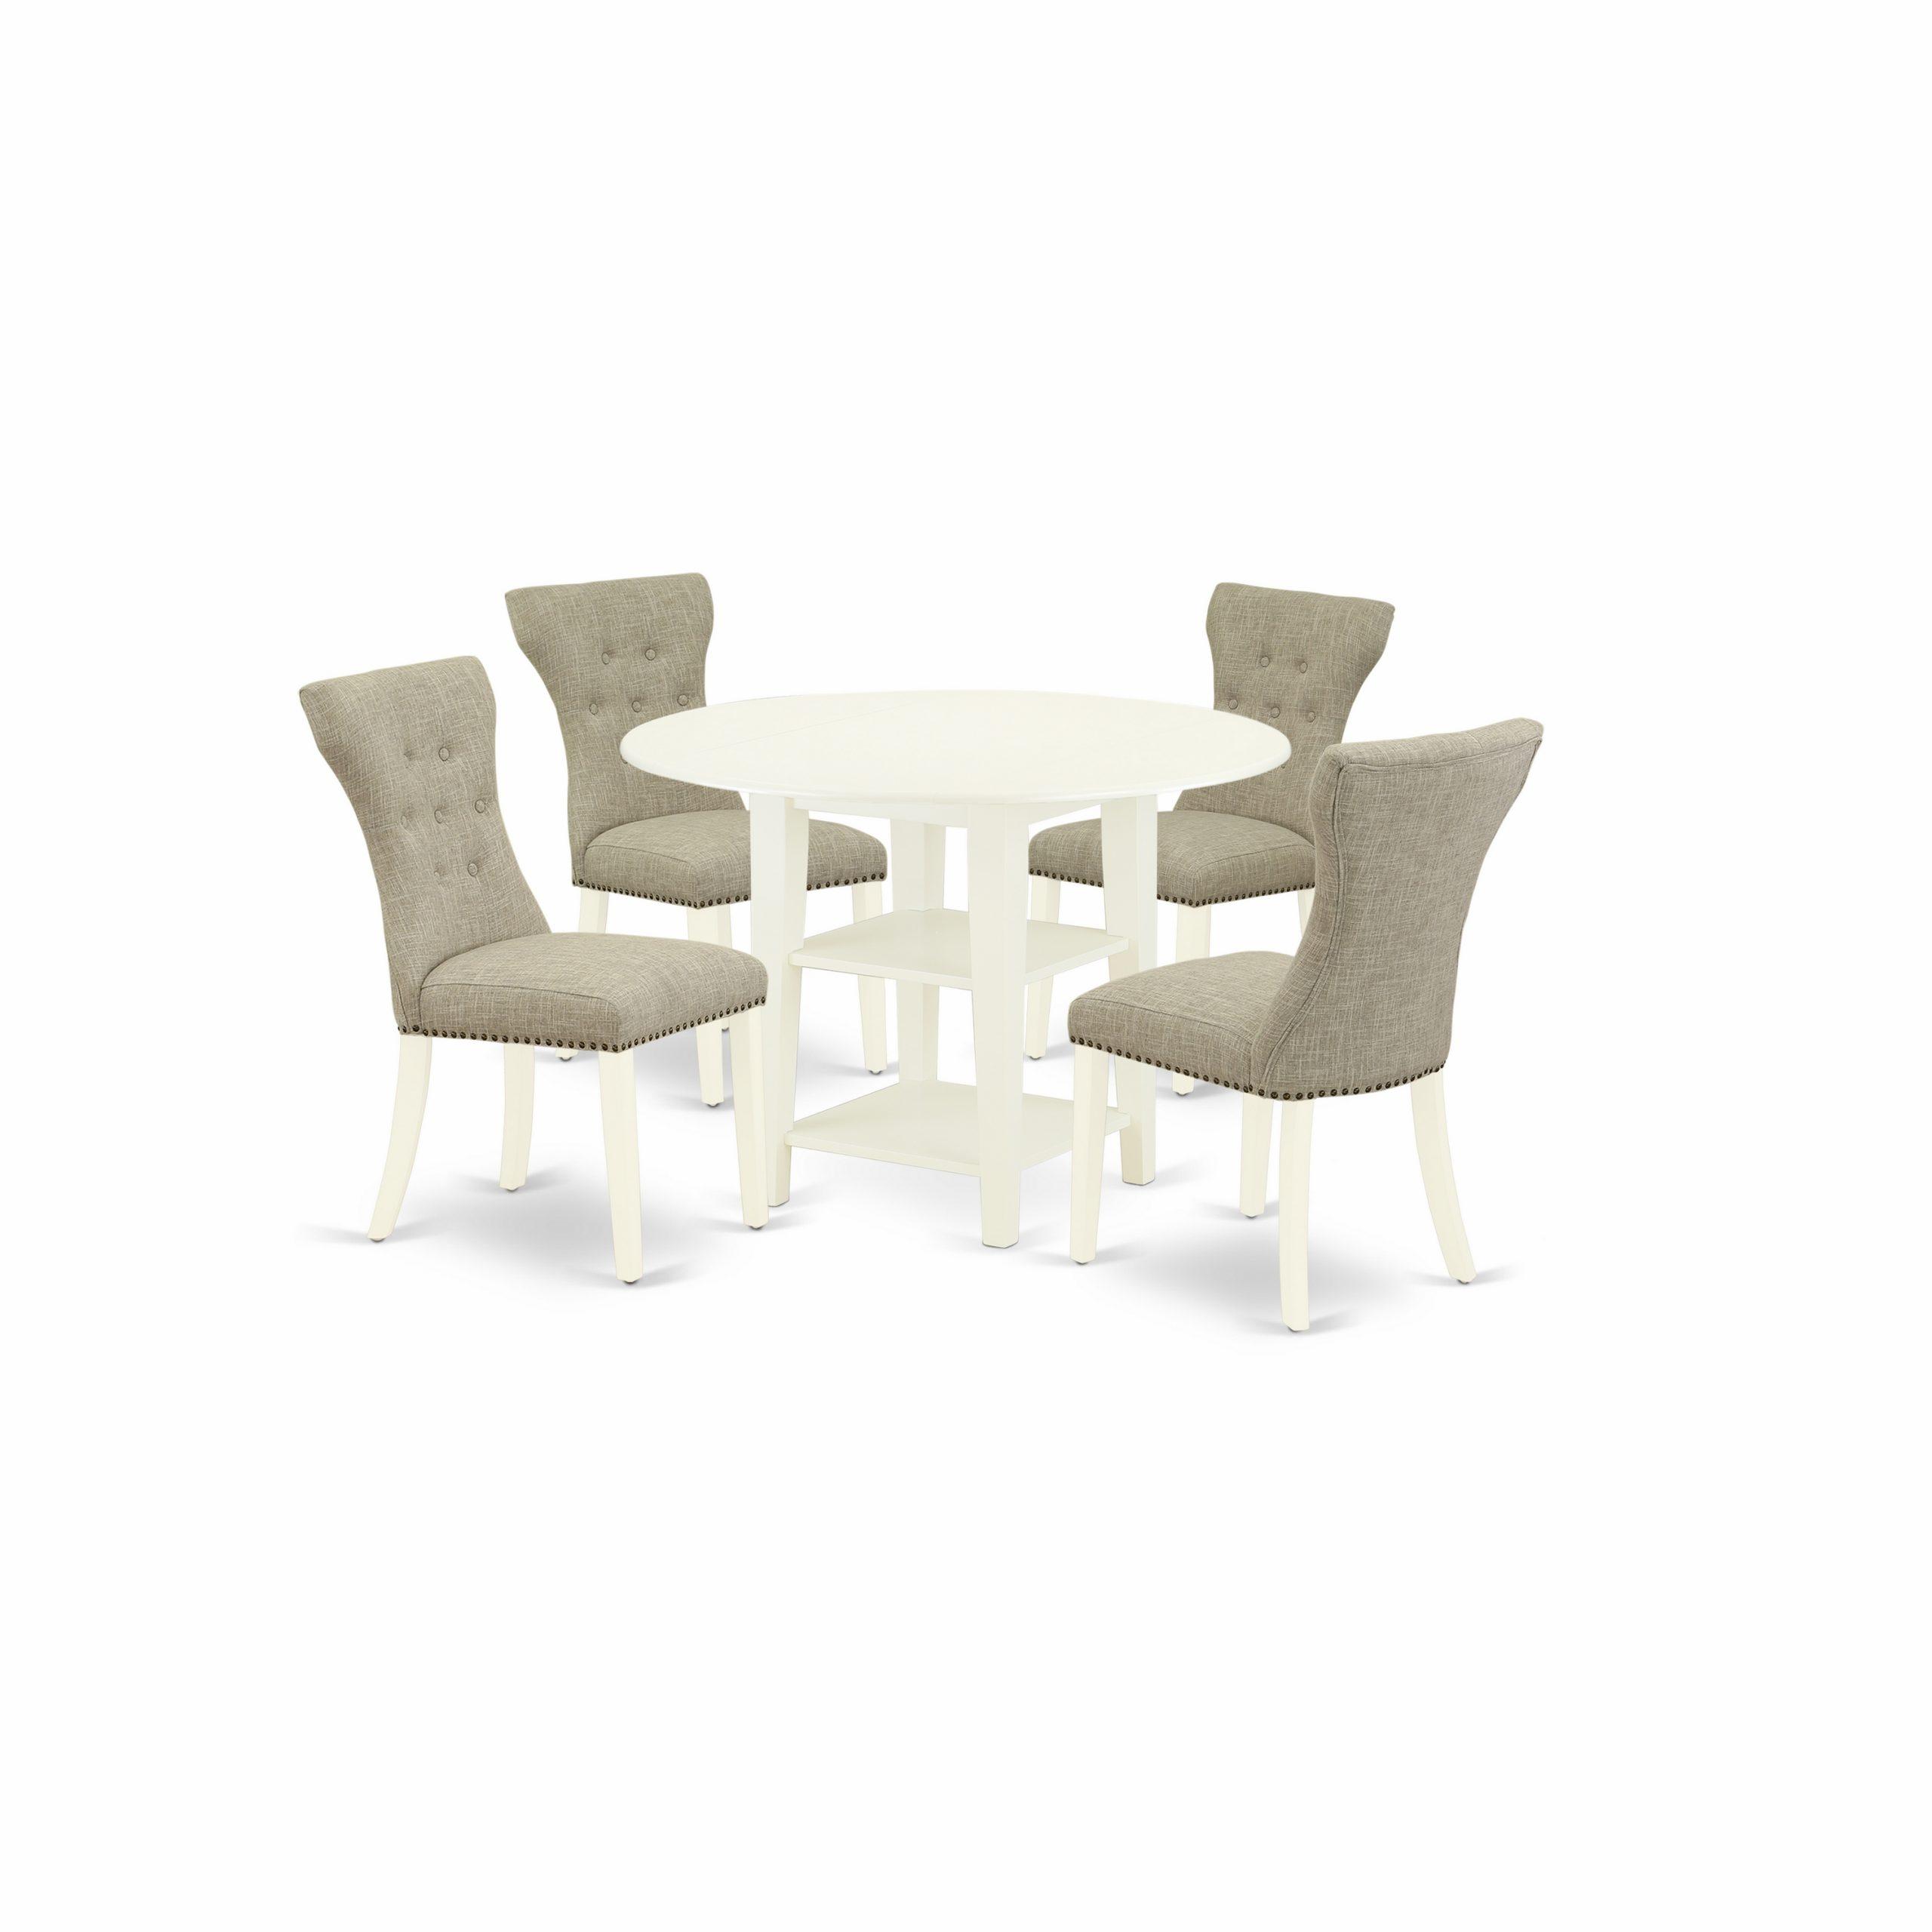 East West Furniture Suga5 Lwh 35 5 Piece Round Dining Regarding 2018 Montauk (View 7 of 15)